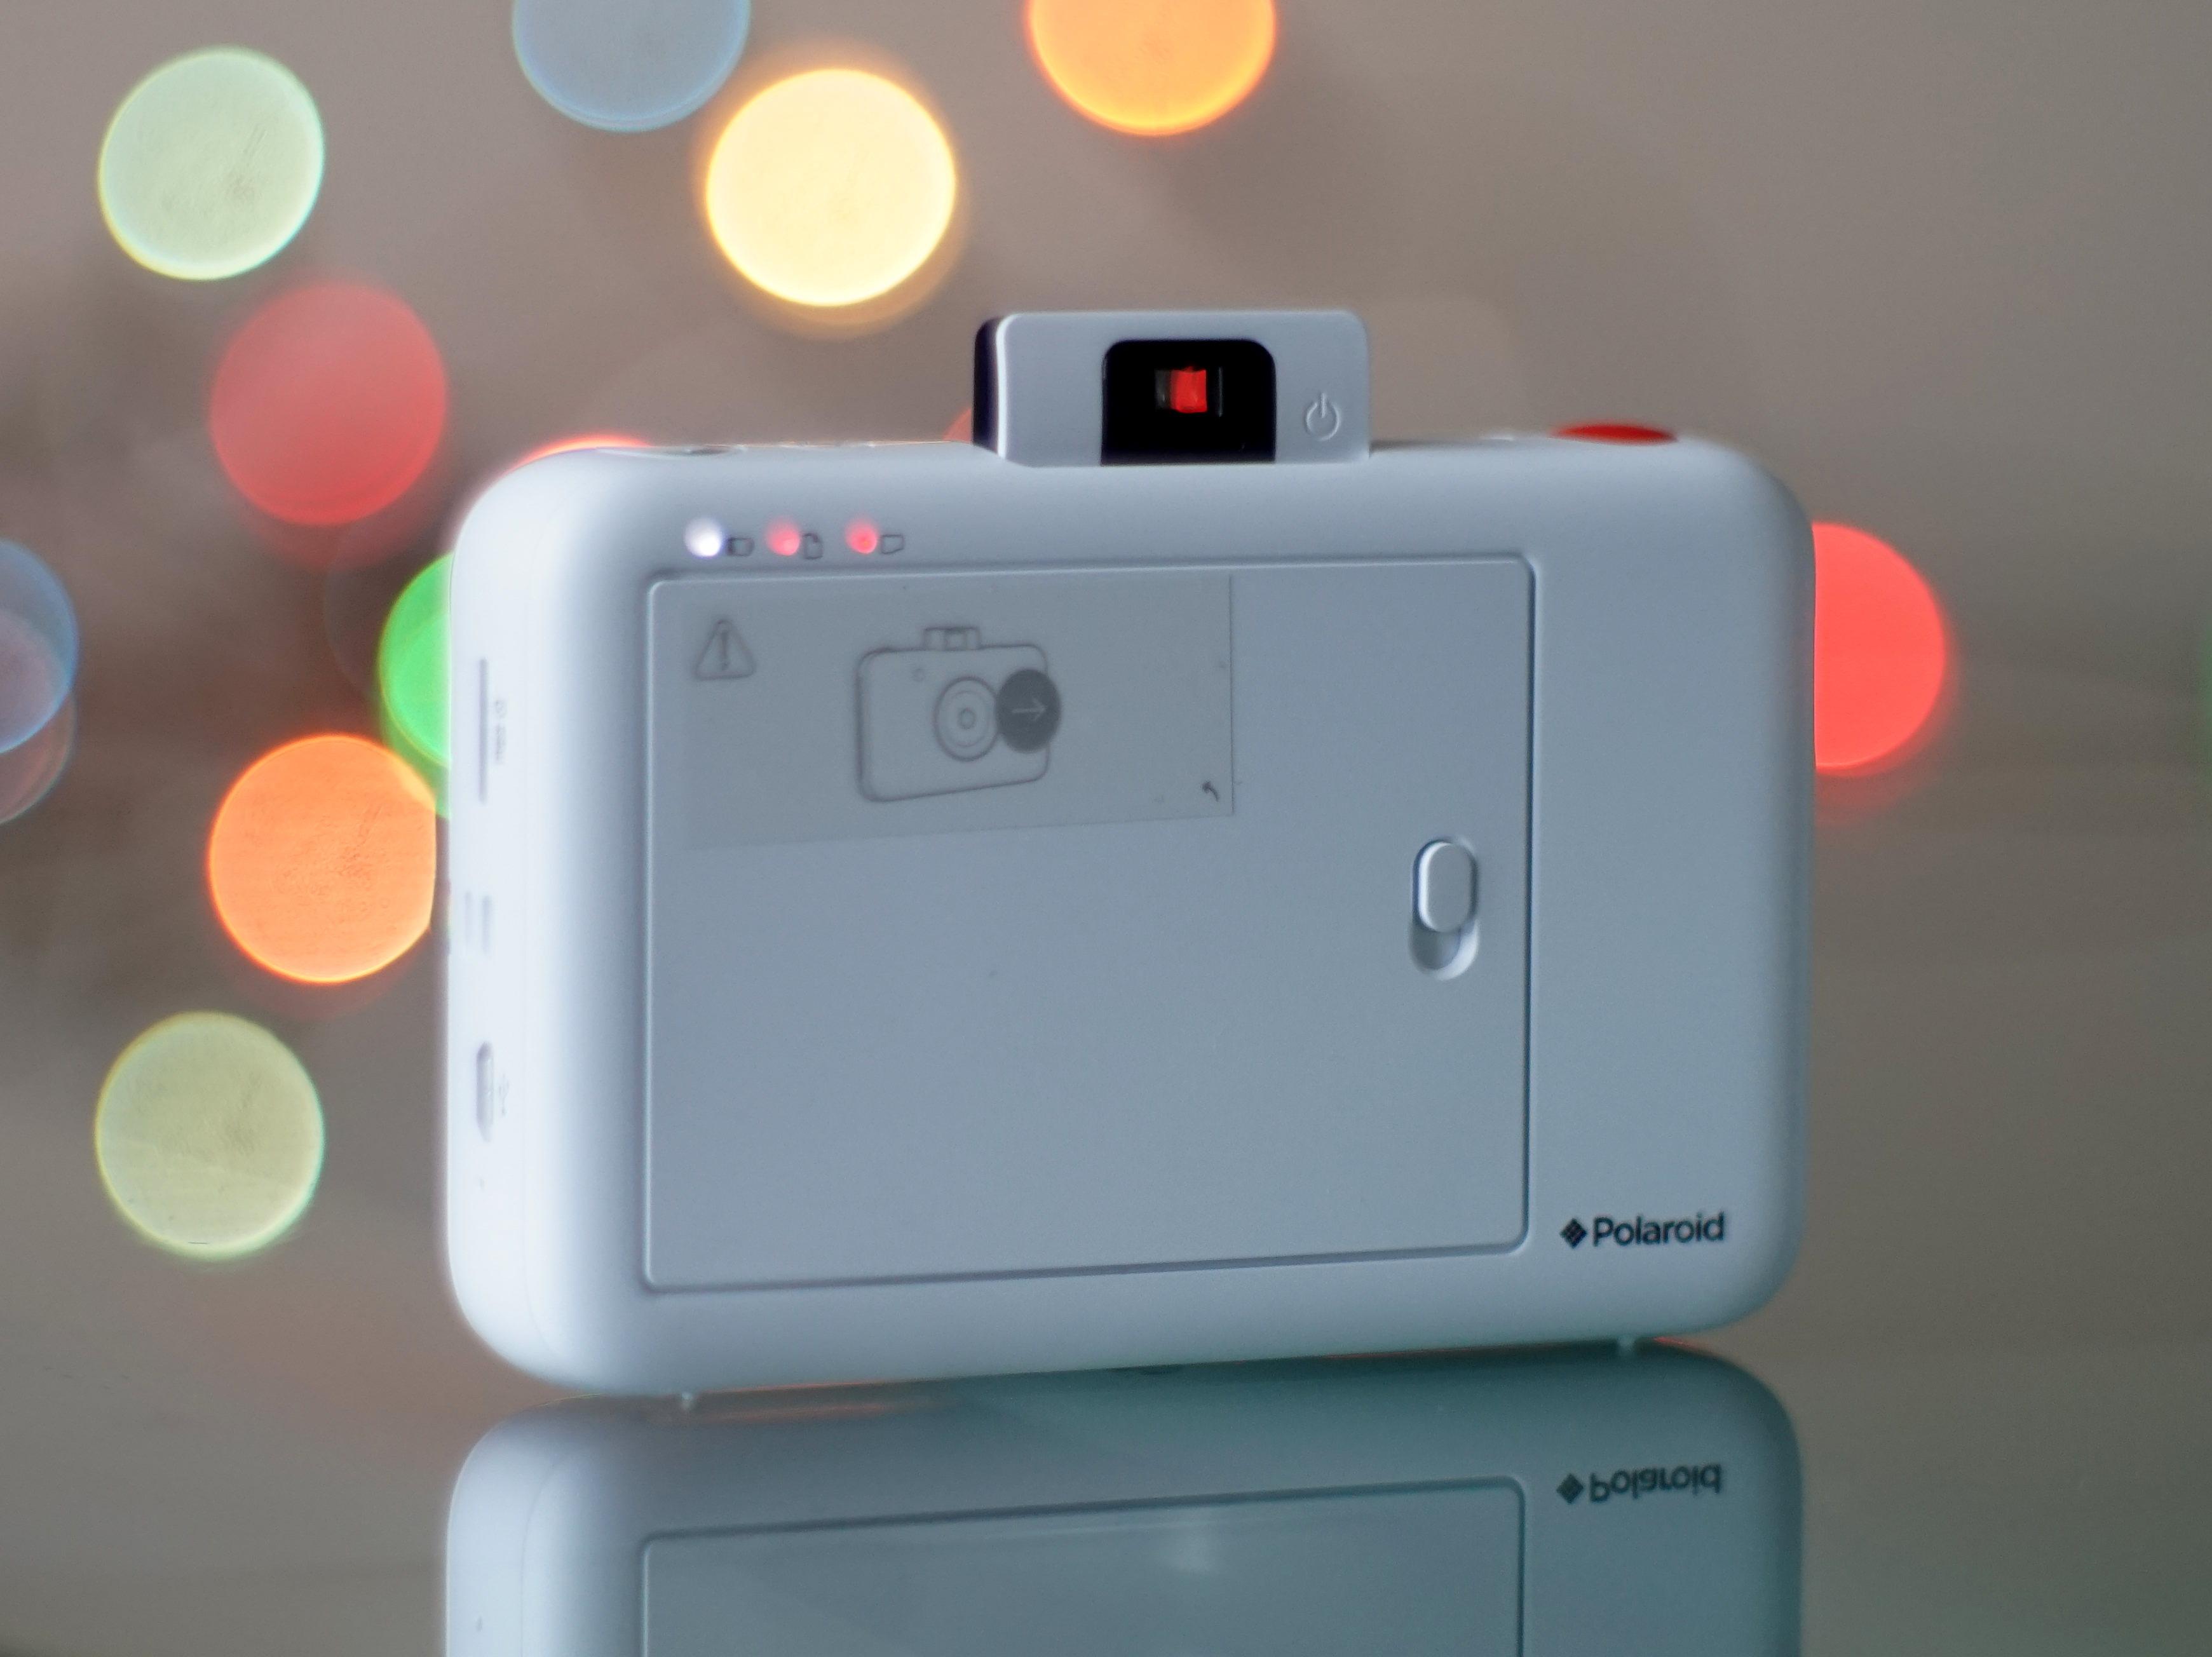 Polaroid snap digital camera reviews